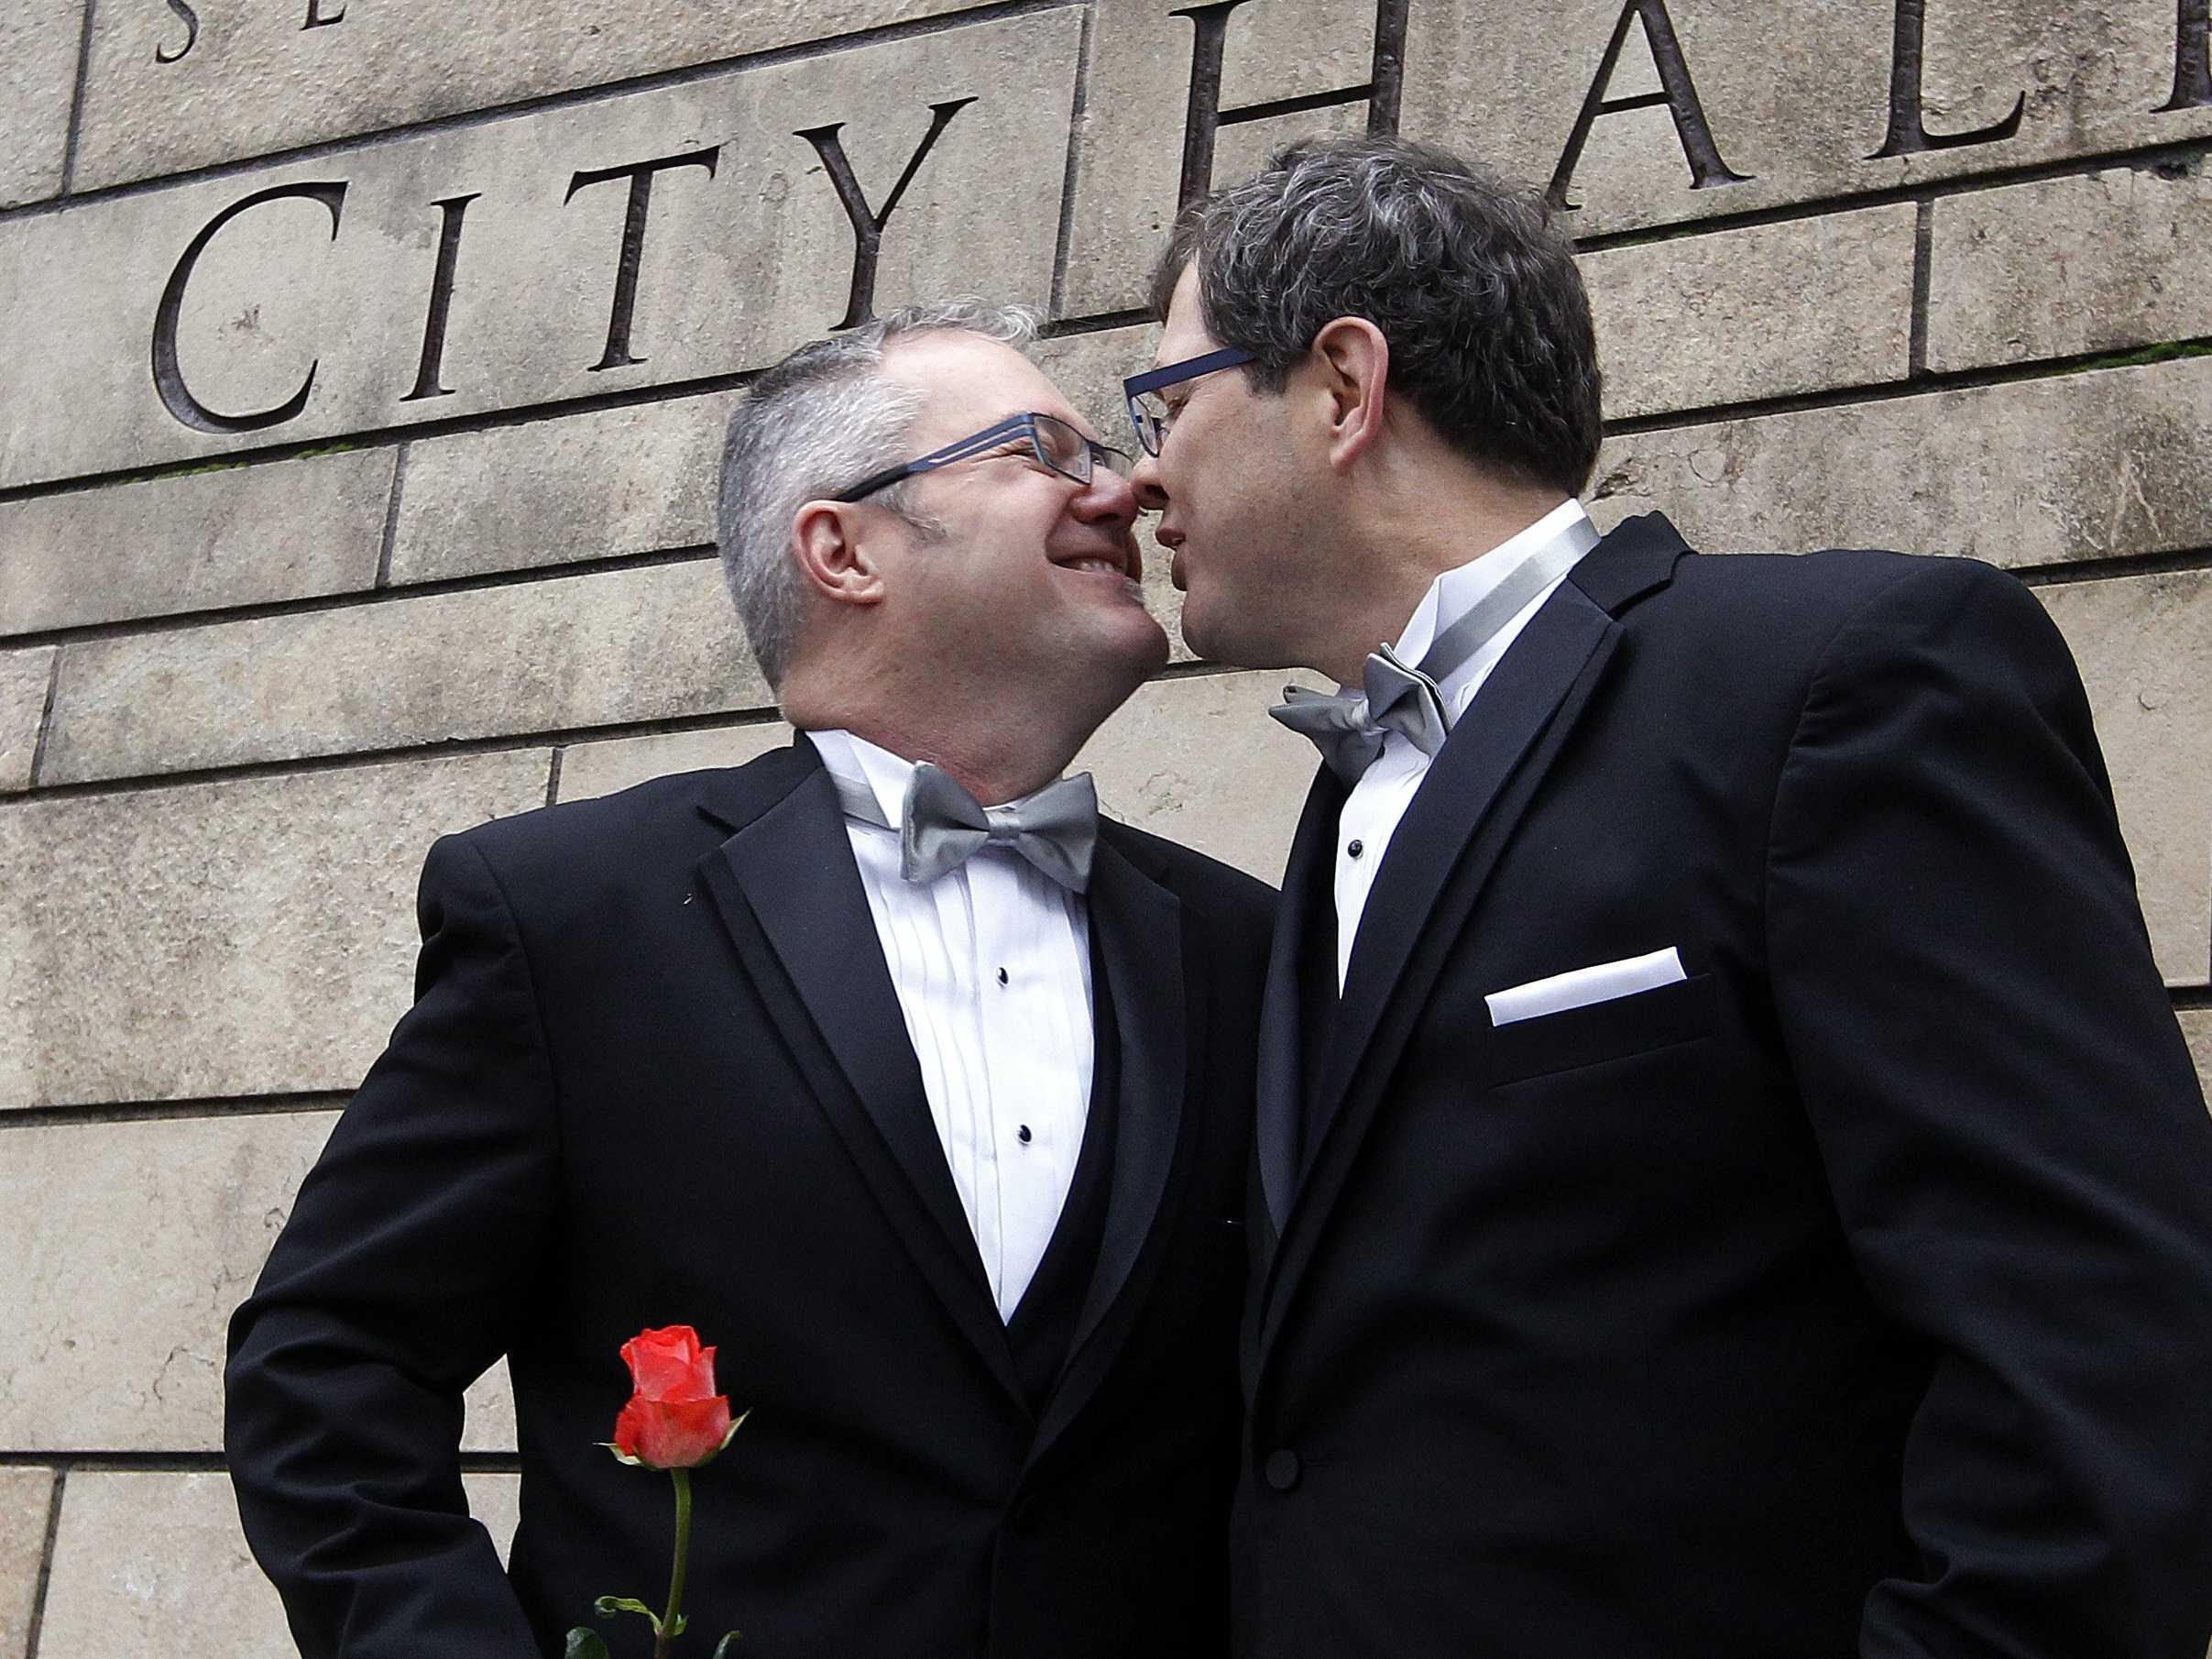 John boehner reacts to obama talking about gay marriage in typical john boehner fashion